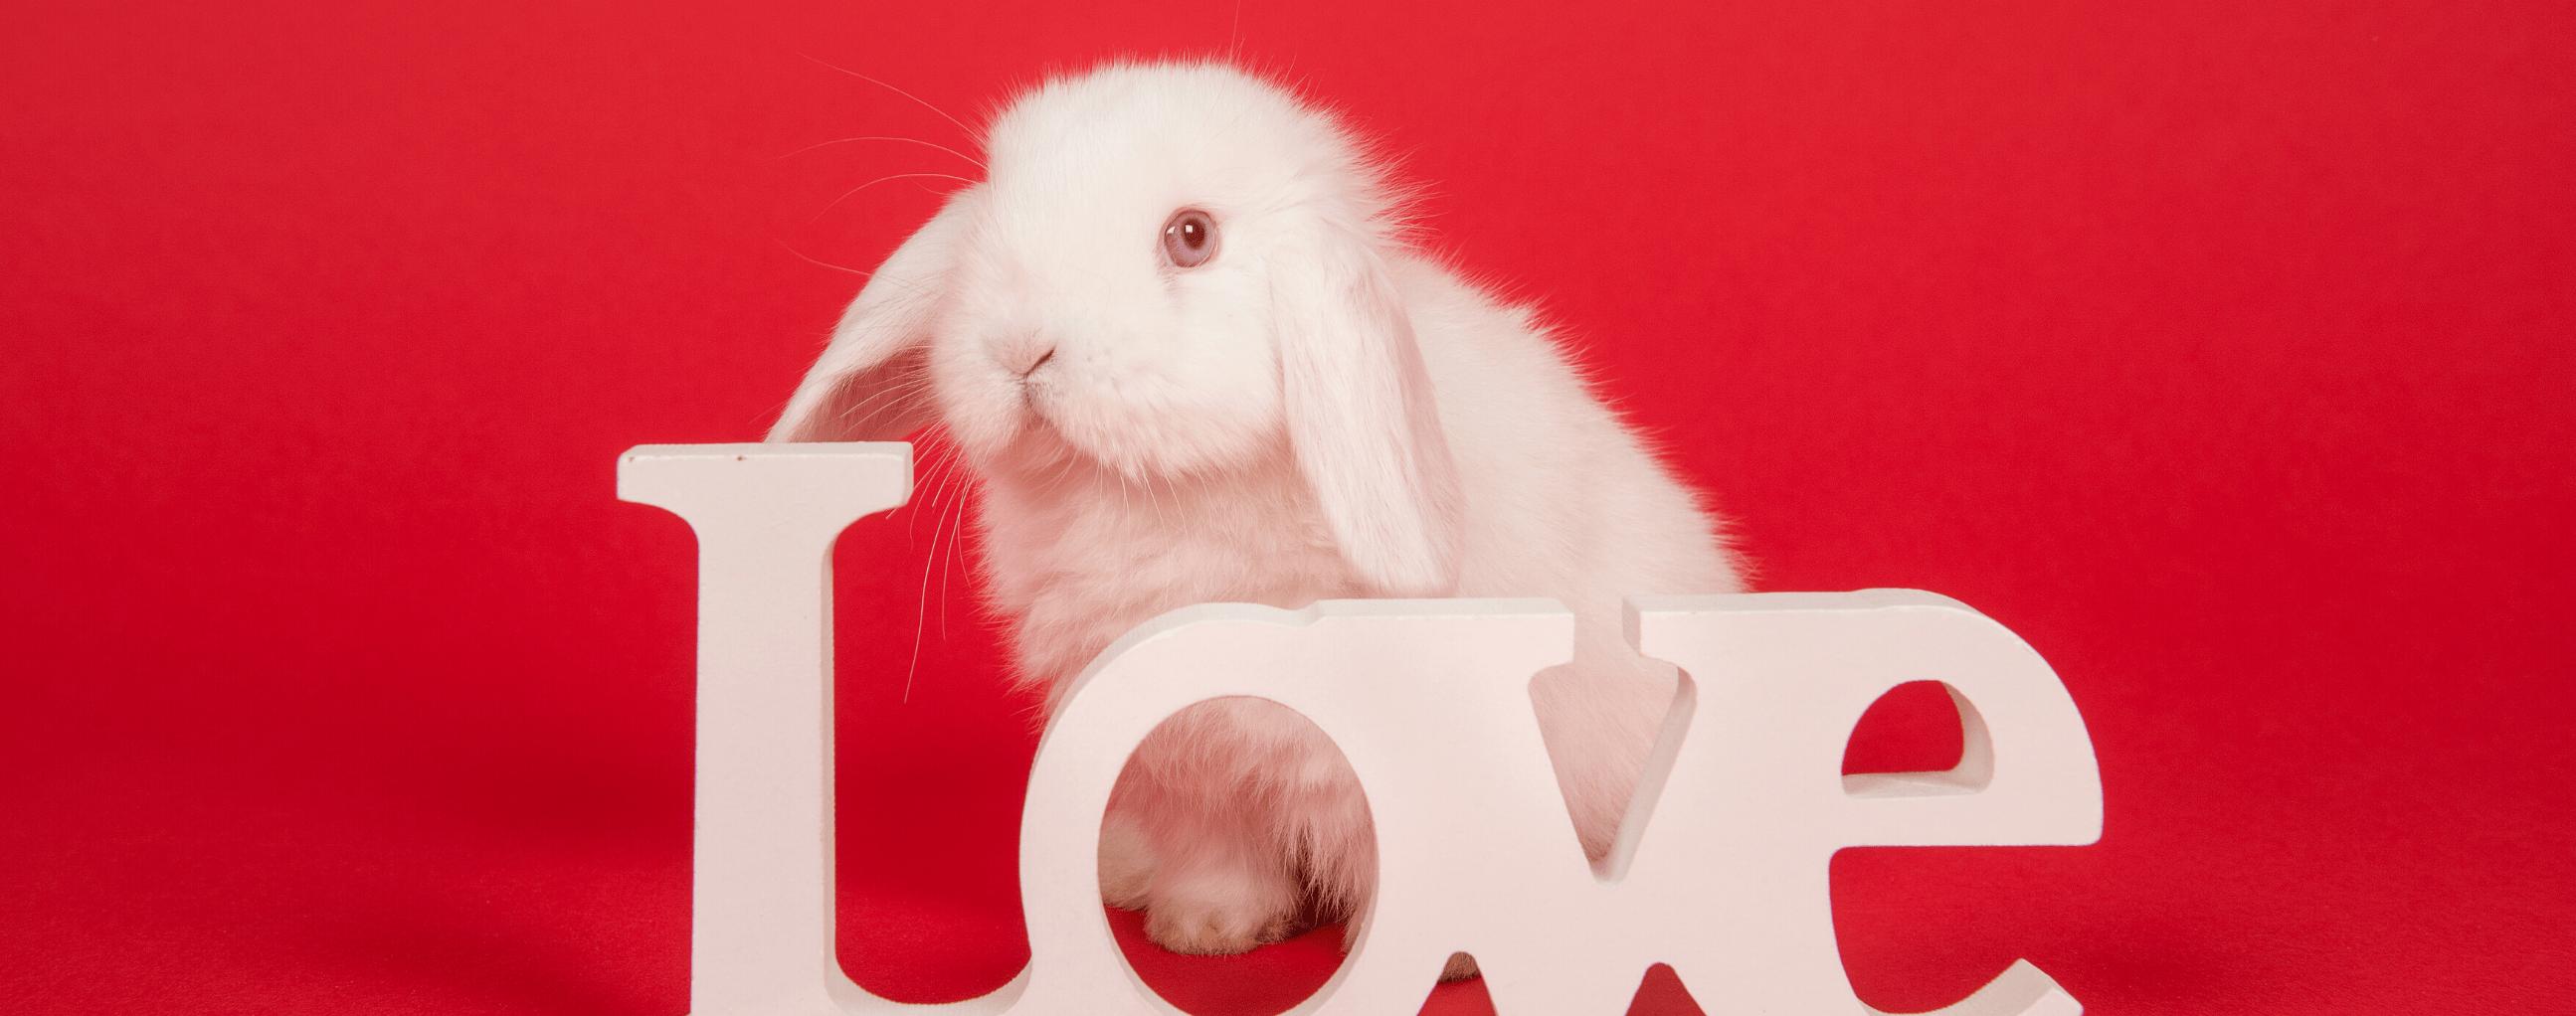 Valentine's Date Ideas - Bunnies and Wine